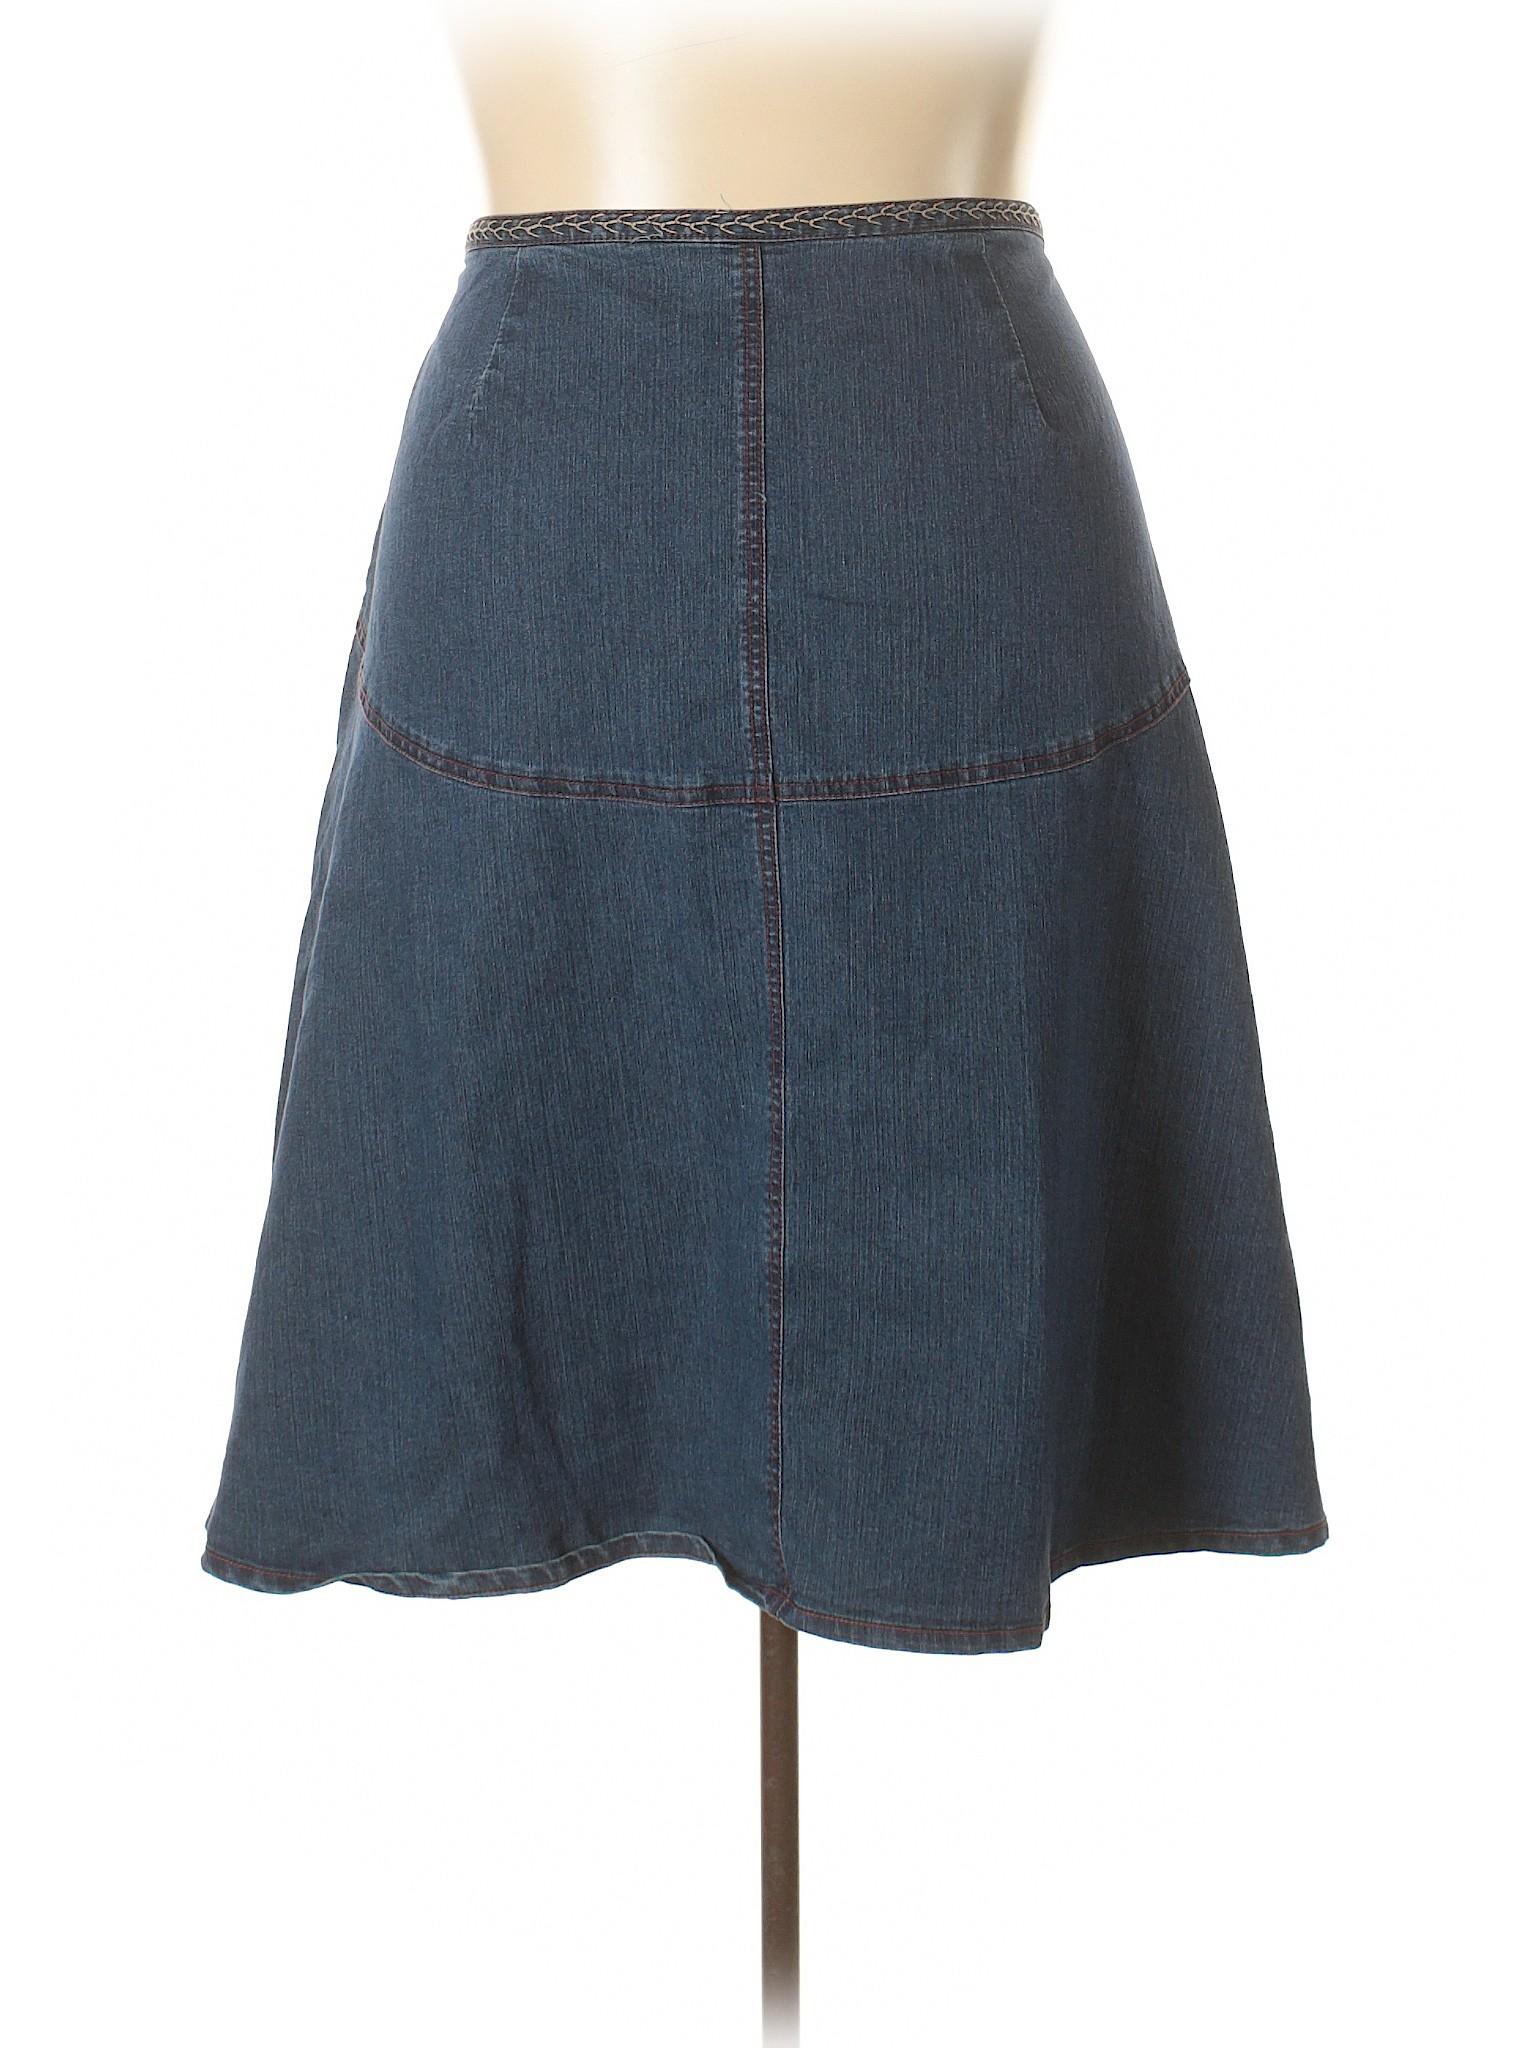 Casual Boutique Boutique Casual Skirt Boutique Skirt Boutique Casual Casual Skirt YWwBnqn1Ef